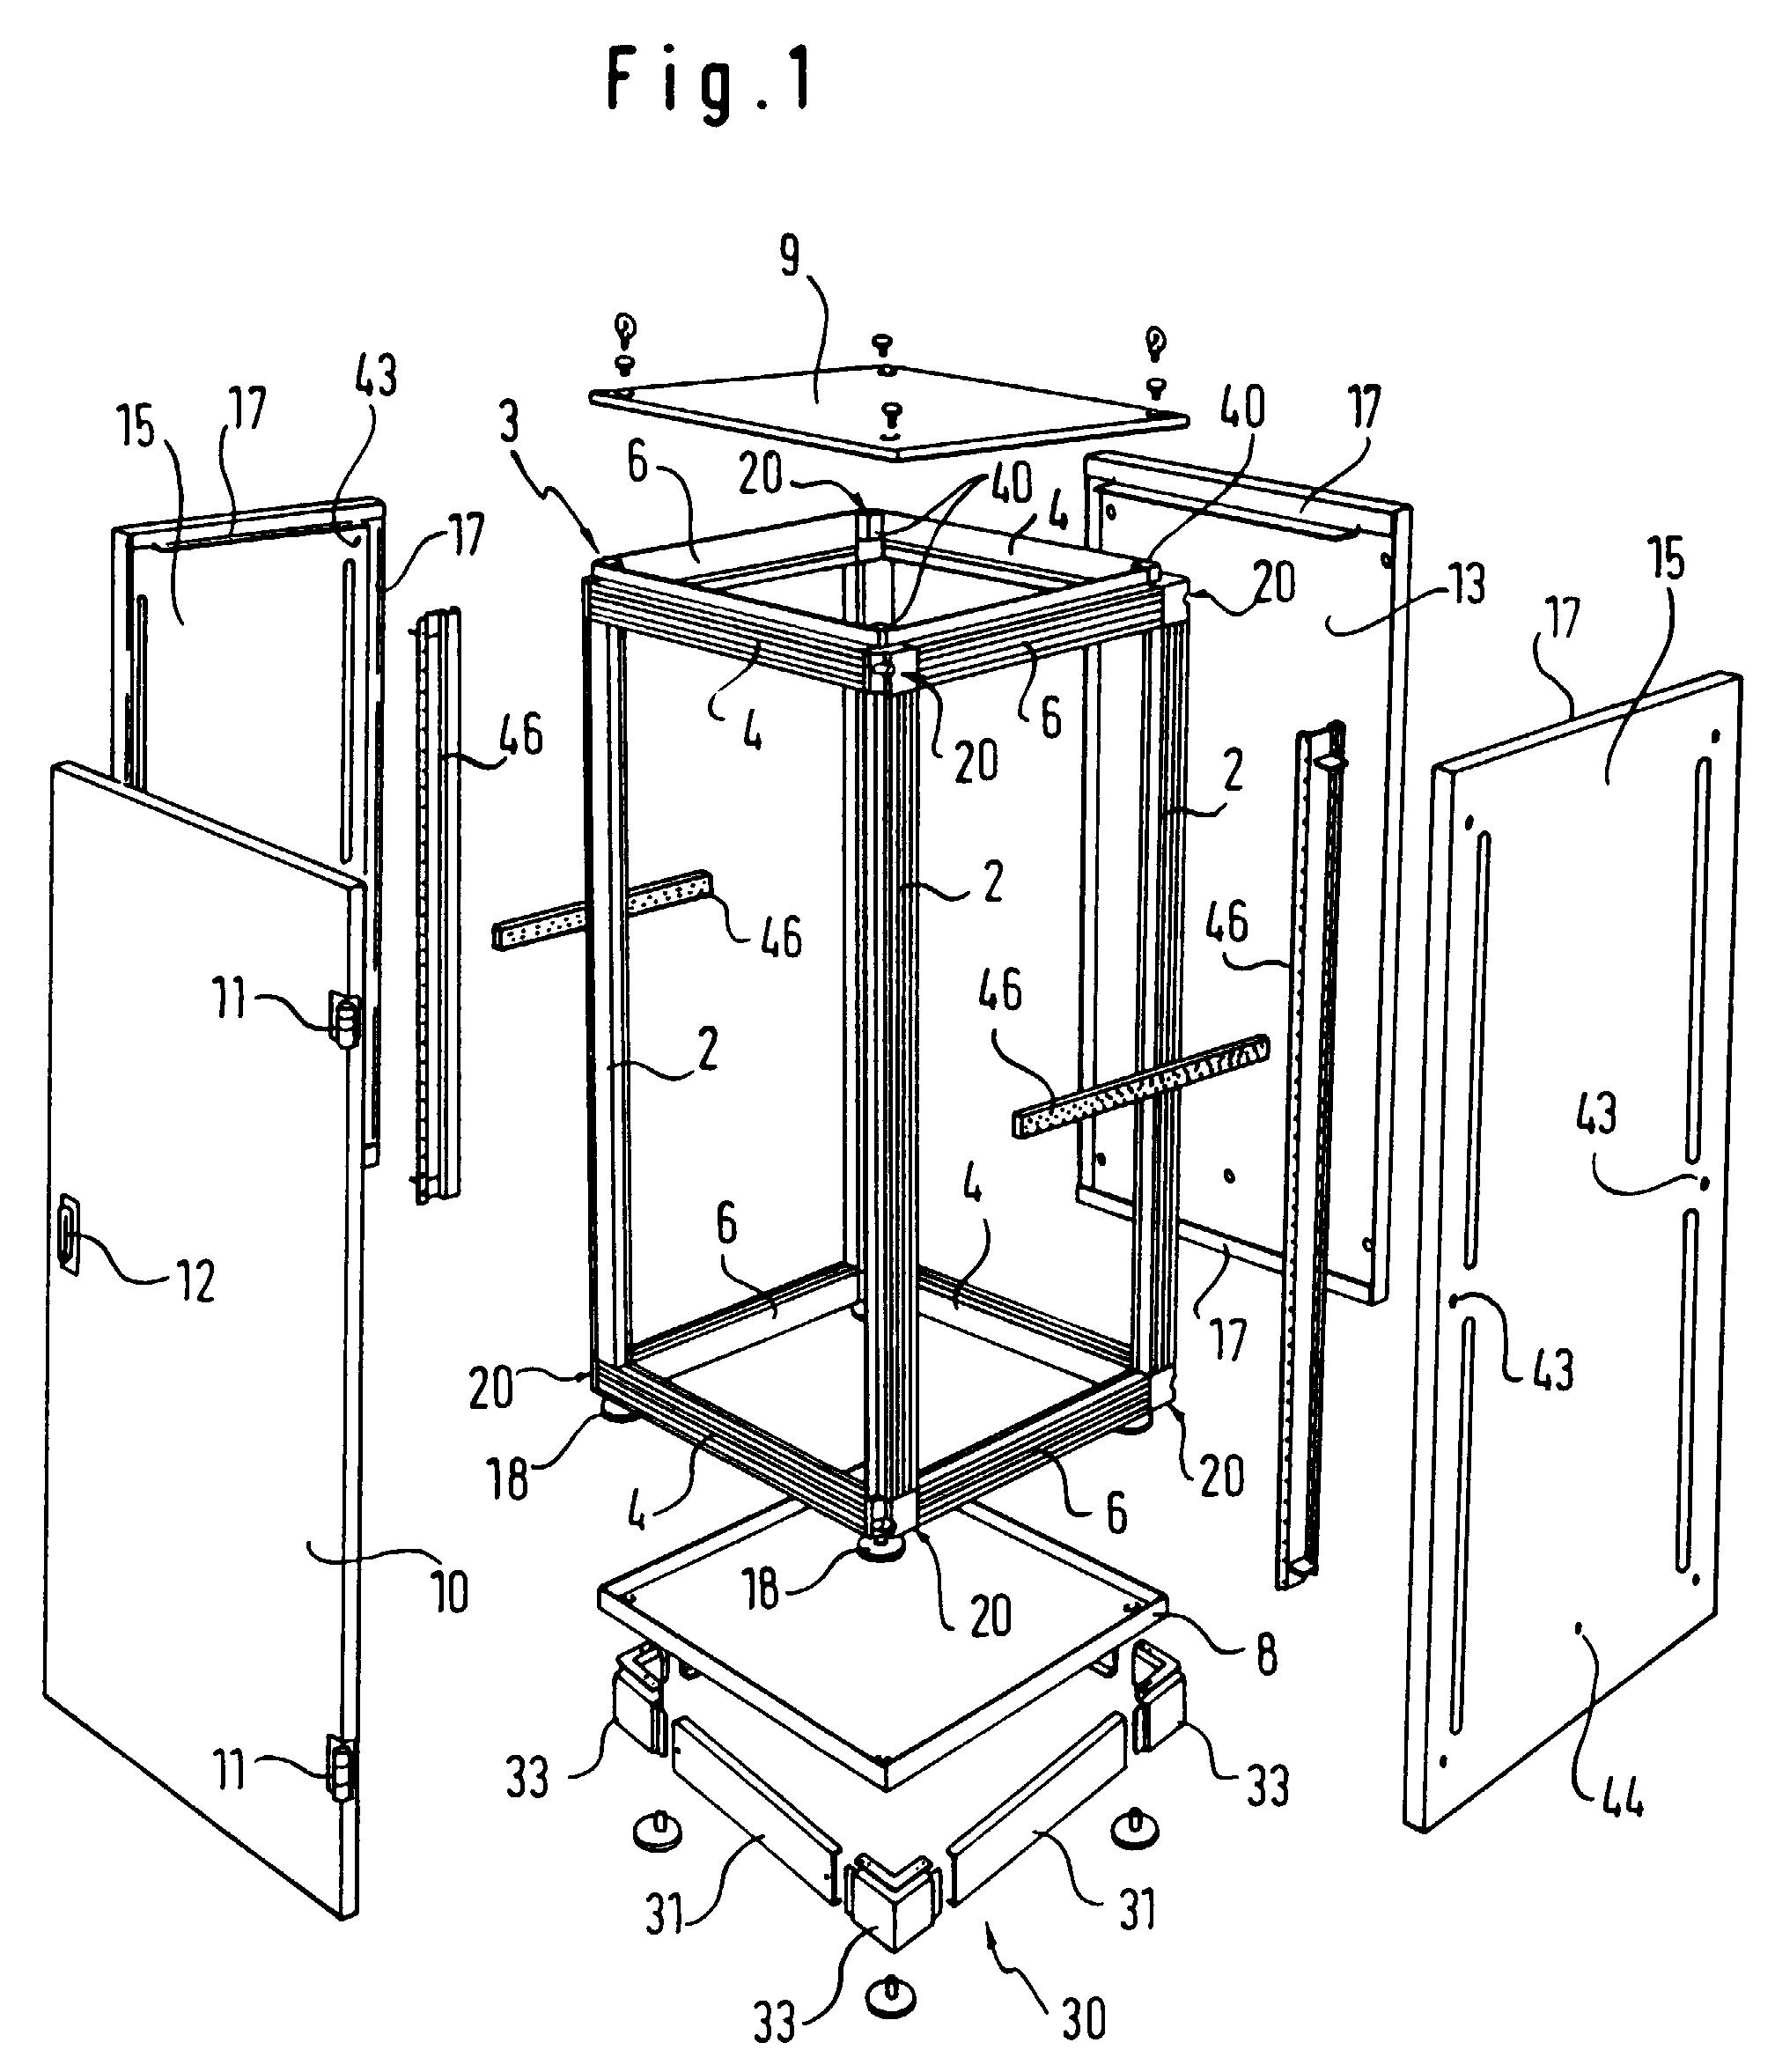 patent ep0686316b1 schrank google patents. Black Bedroom Furniture Sets. Home Design Ideas